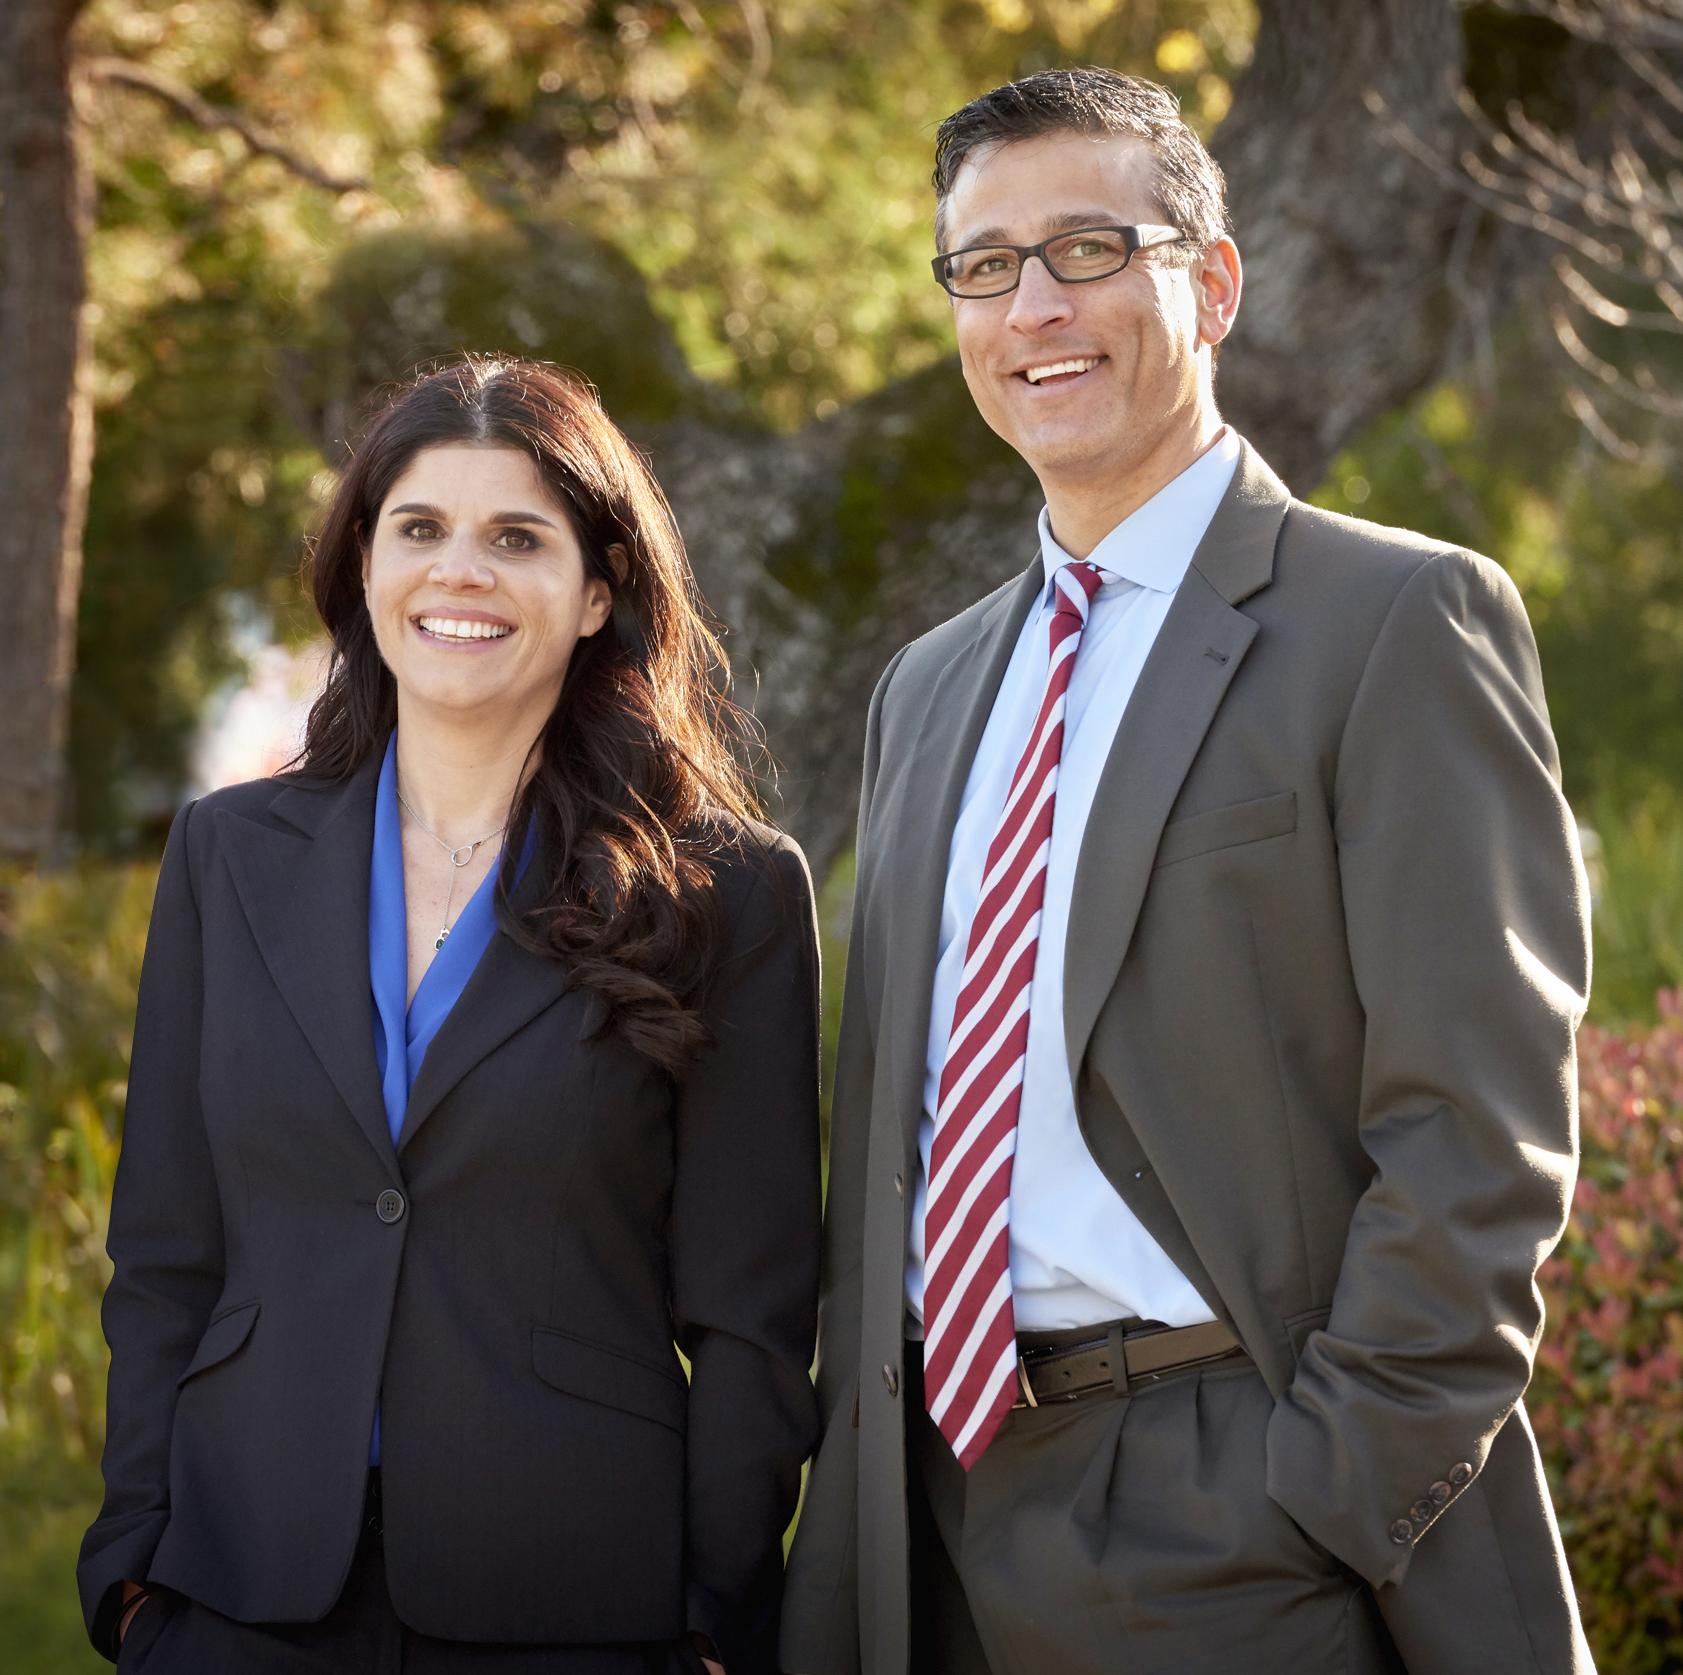 Stacy North & Scott Berman